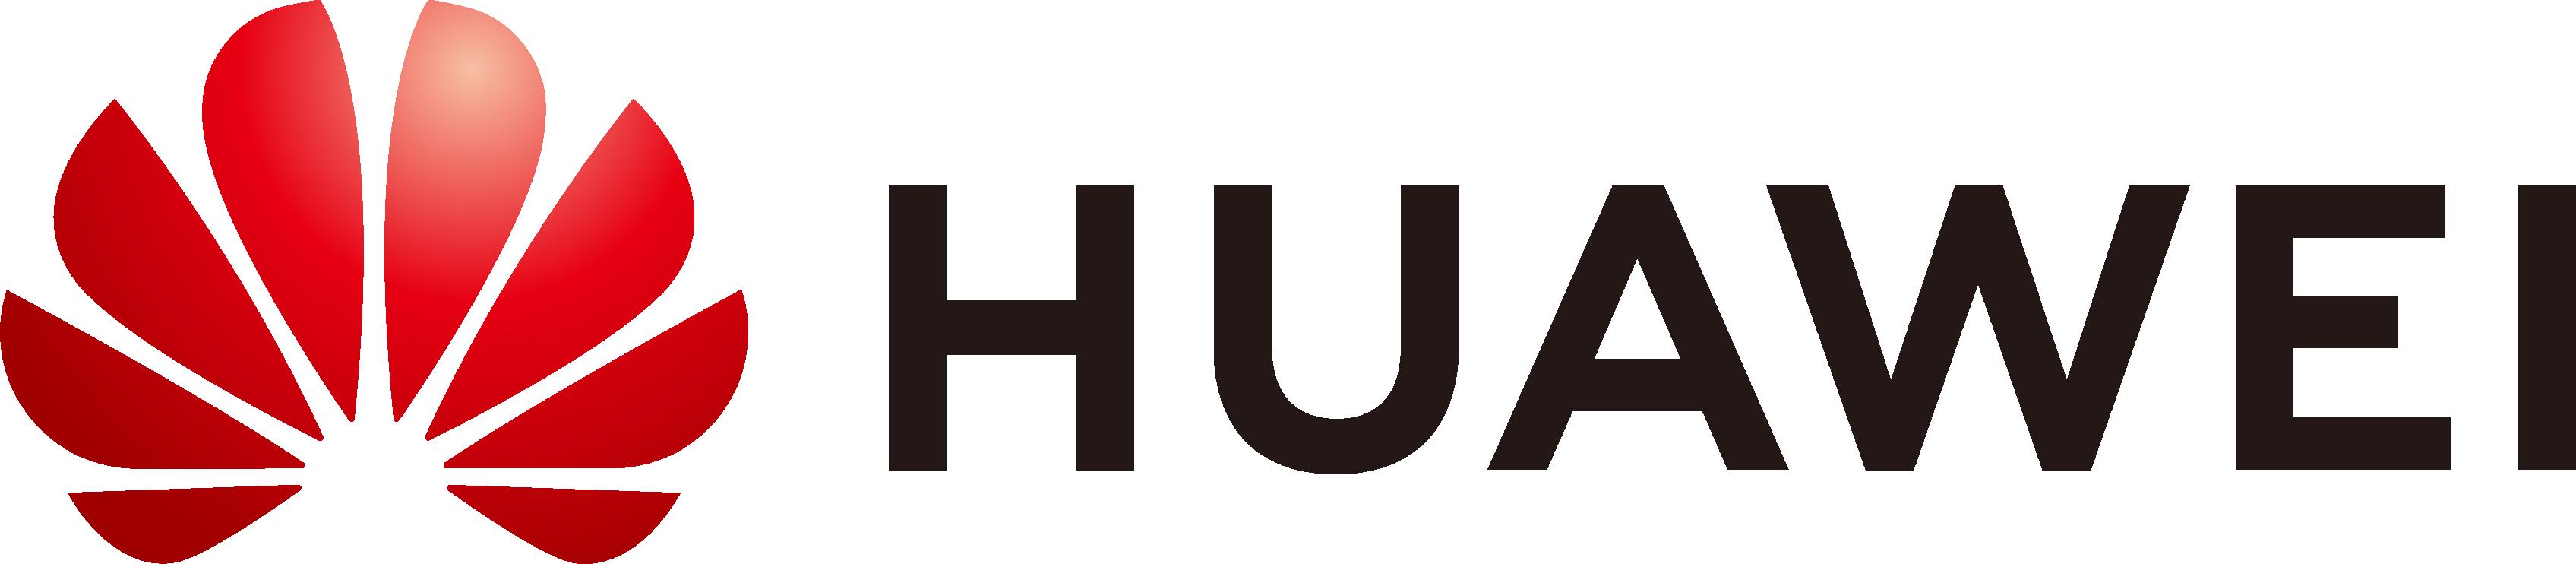 HUAWEI CLOUD Meeting Solution